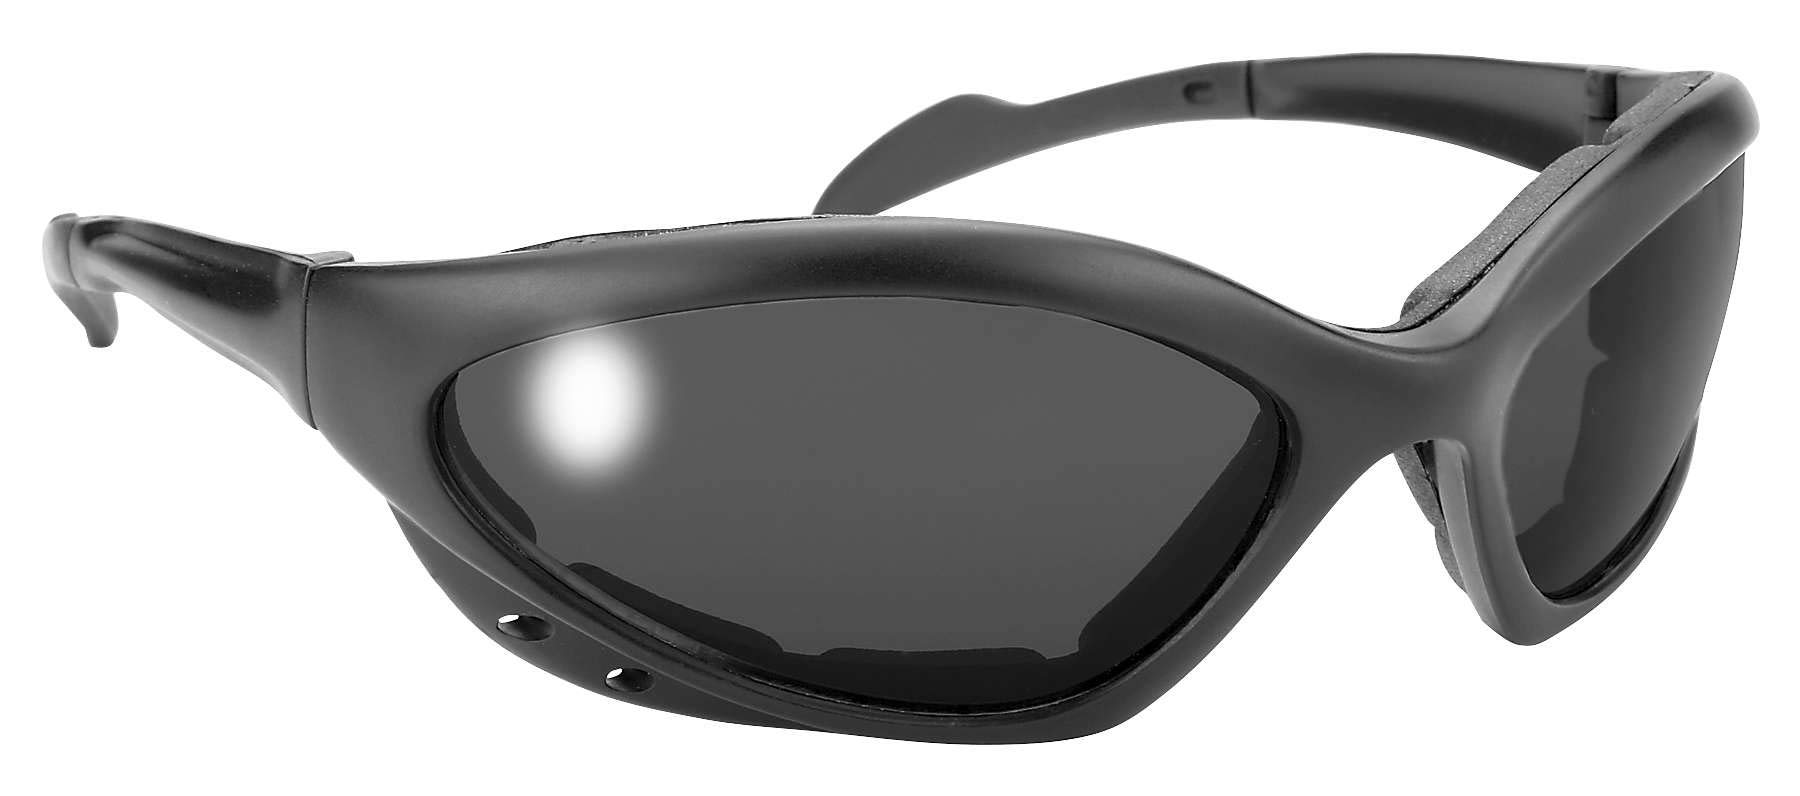 Pacific Coast Sunglasses 4380 NAVIGATOR BLK/SMK-12 PK